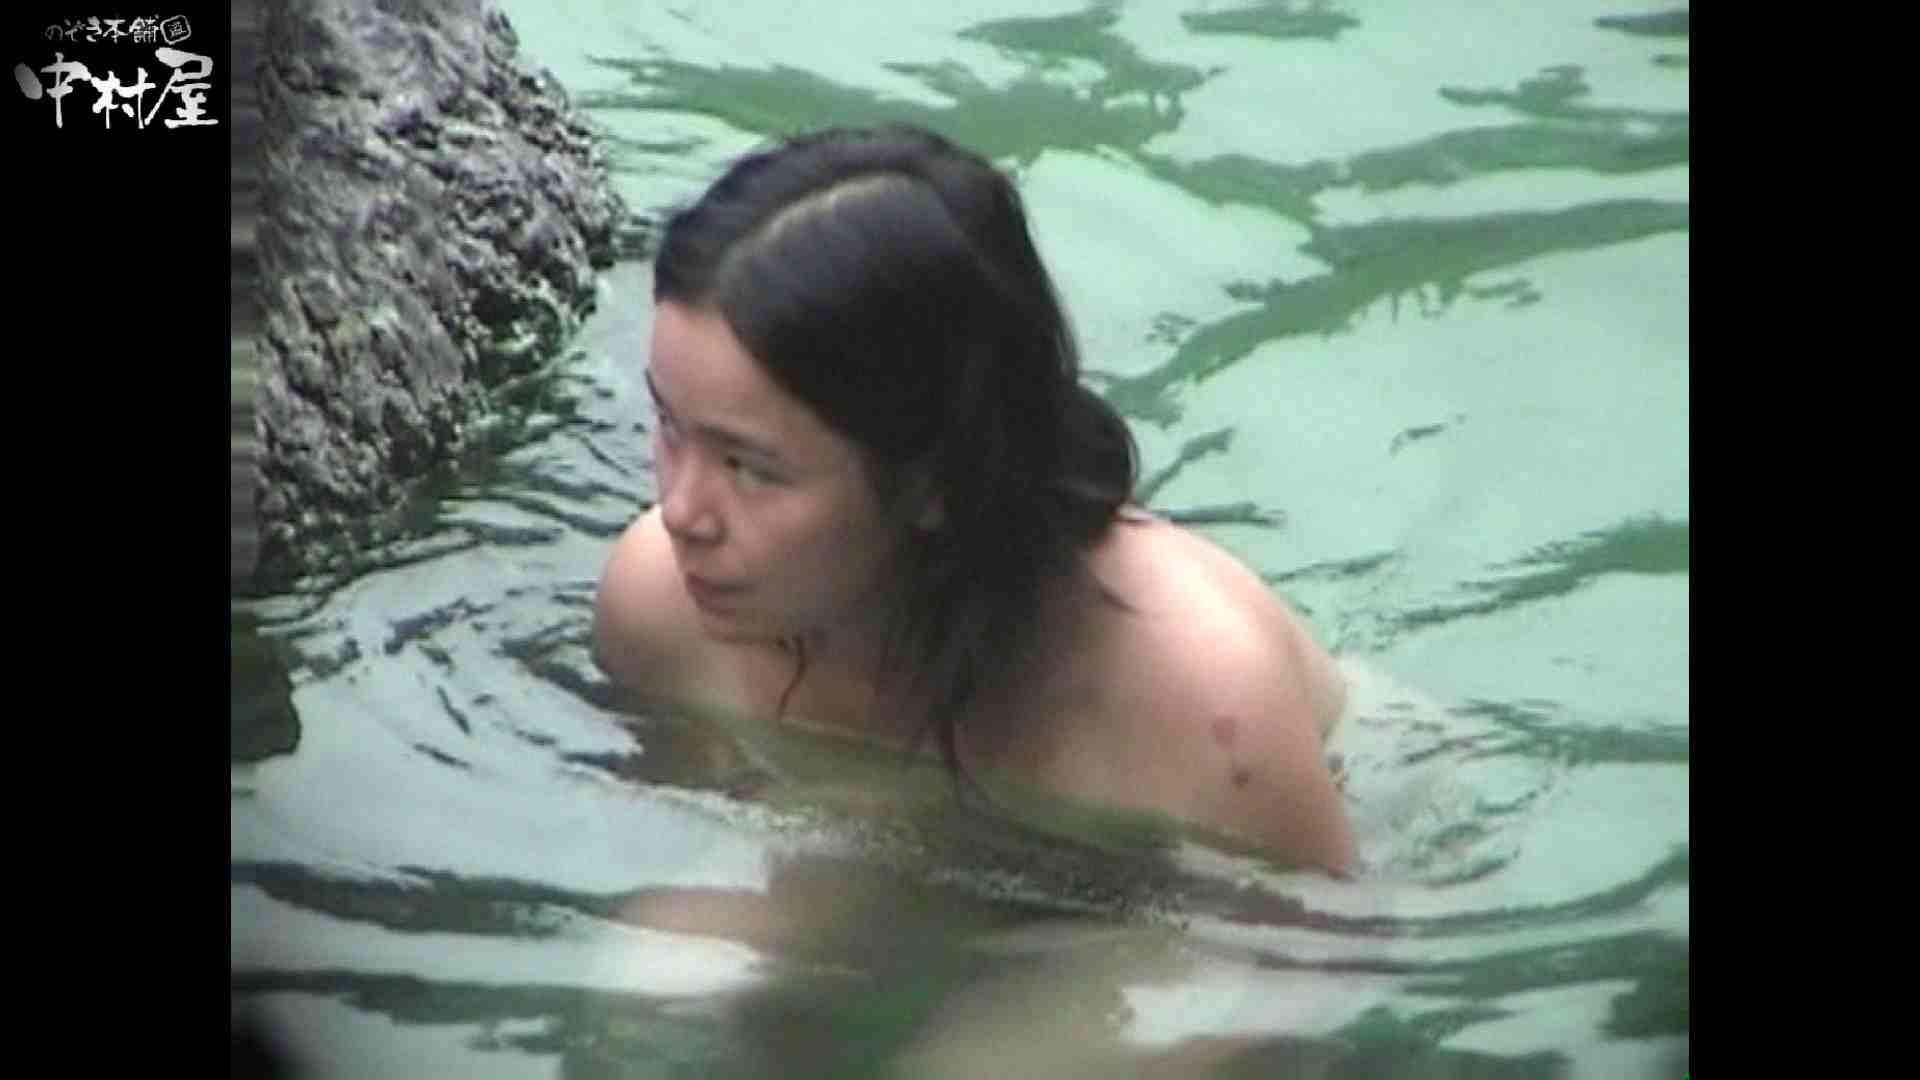 Aquaな露天風呂Vol.954 0 | 0  17連発 9